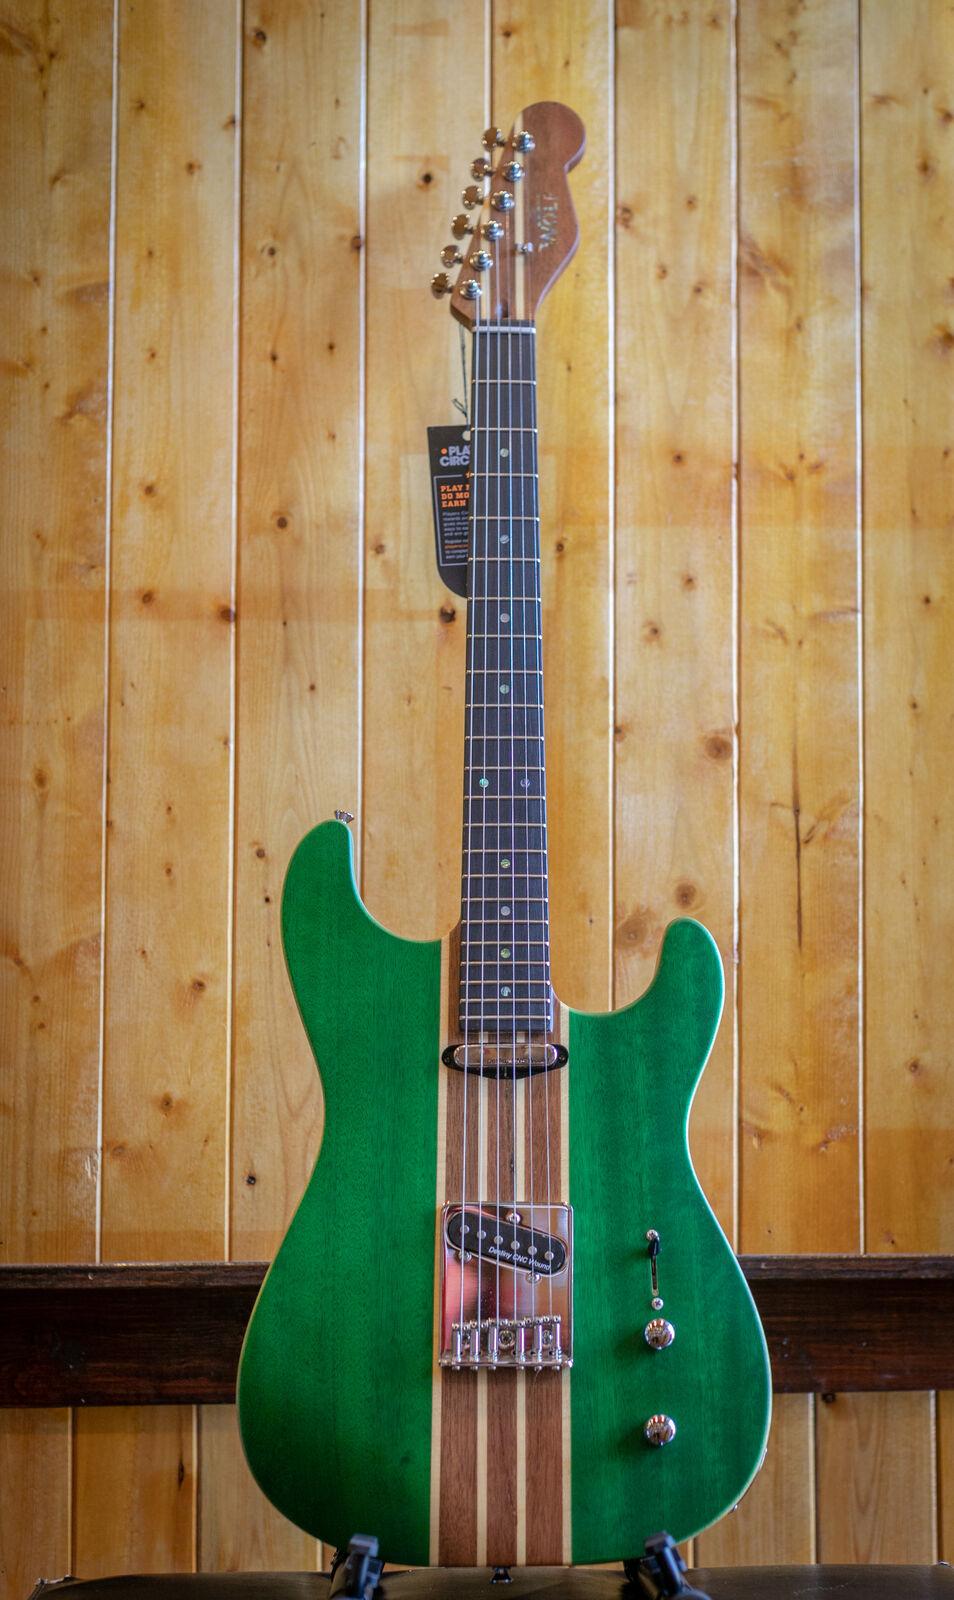 Wolf S1 Electric Guitar - Grün w SKB Hard Case